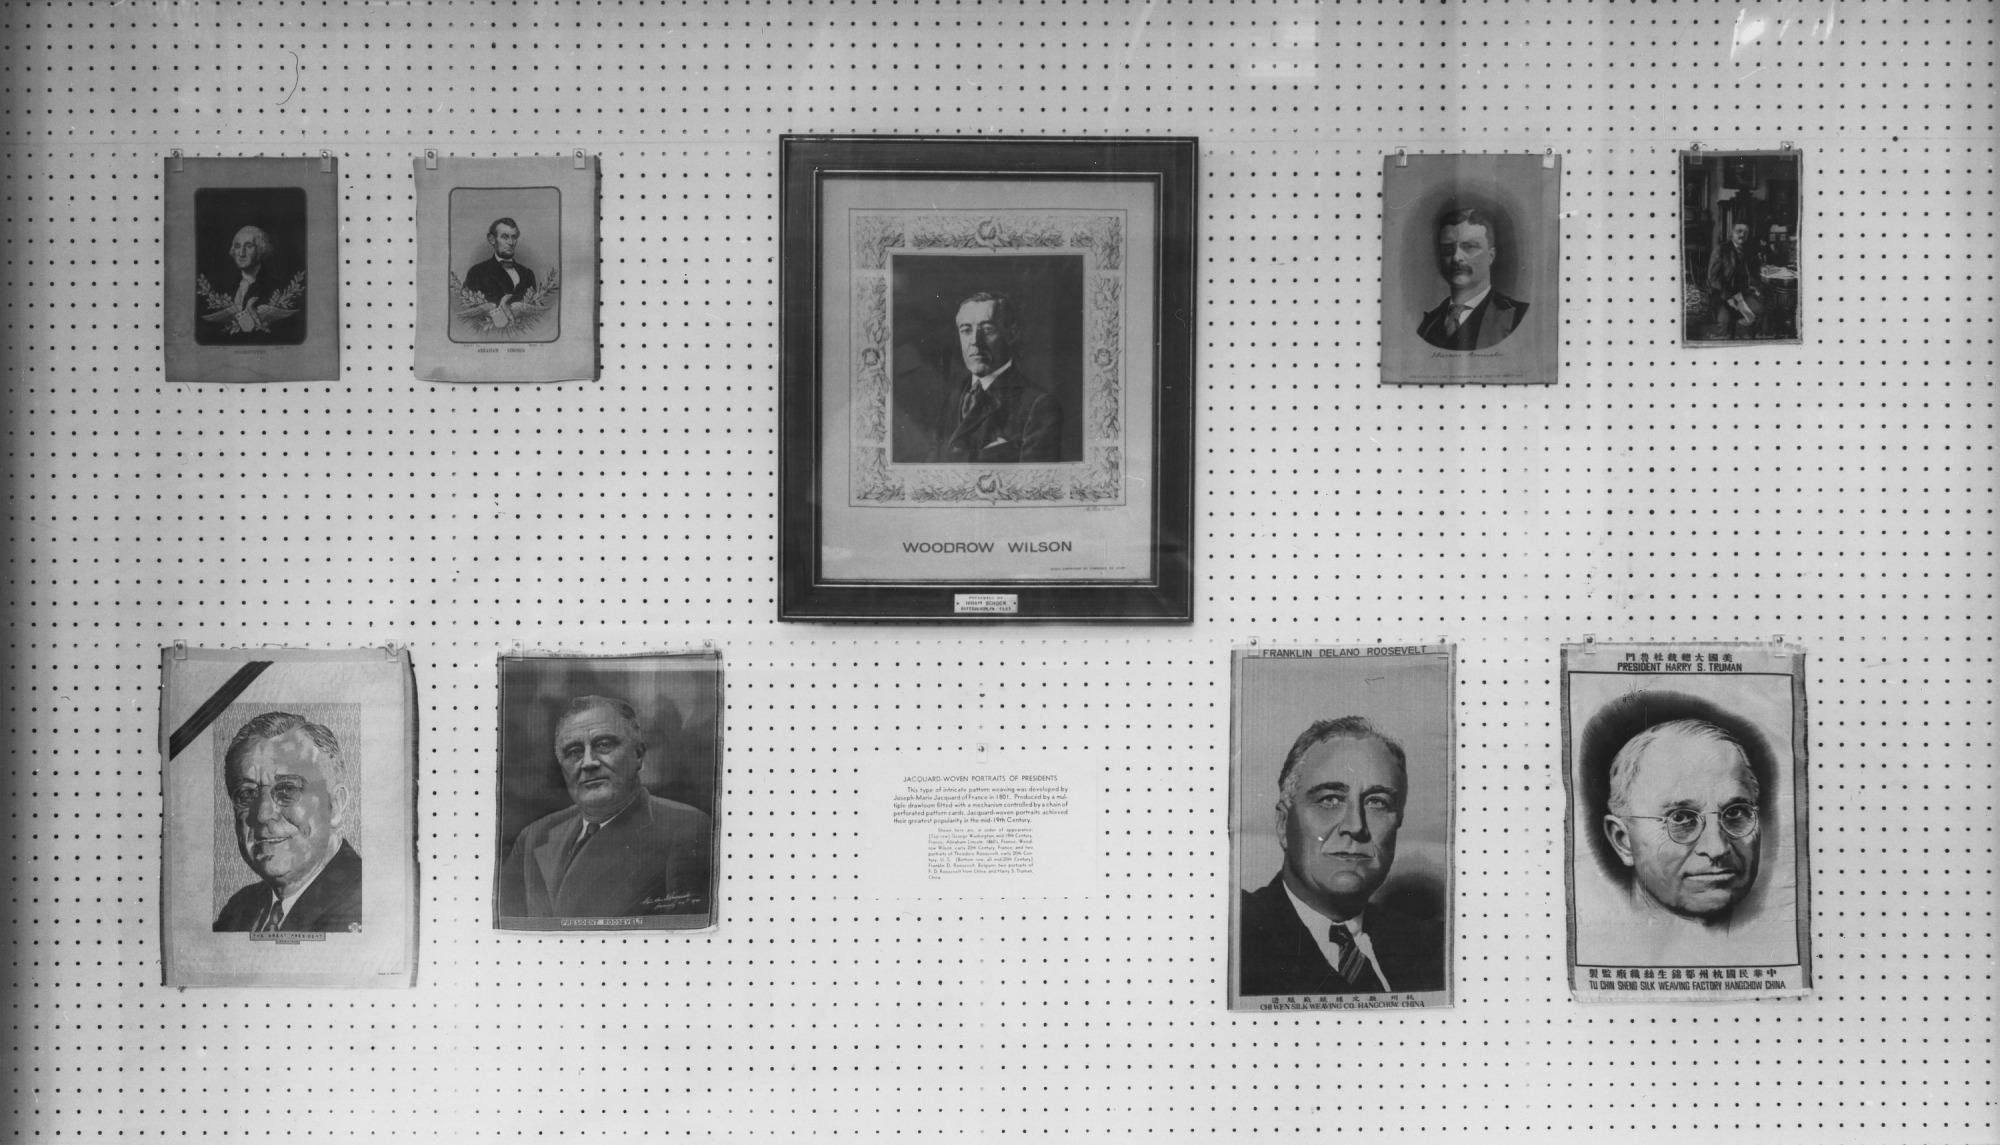 Jacquard Woven Portraits of American Presidents